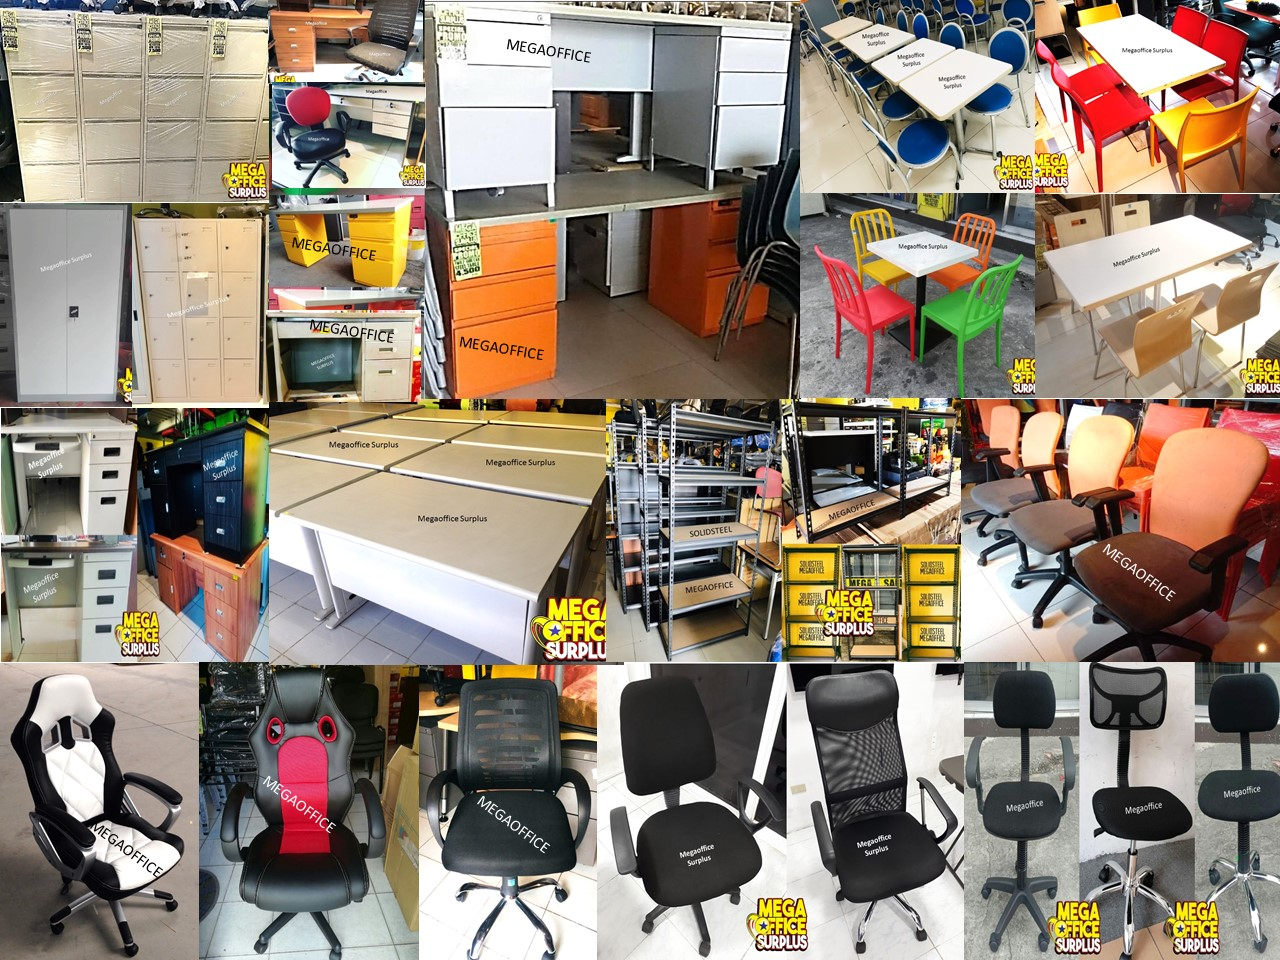 Office Furniture Warehouse Importer Megaoffice